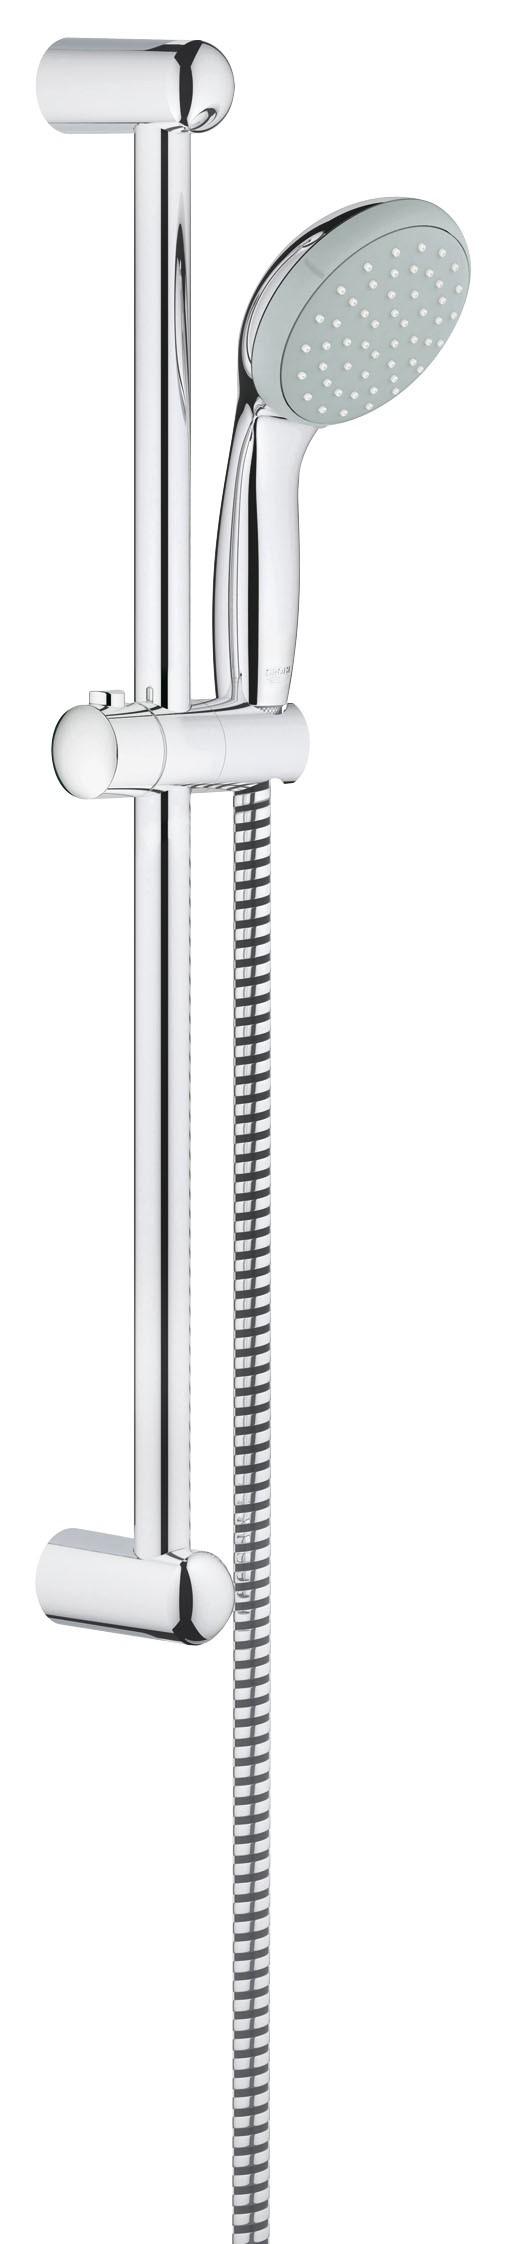 Душевой гарнитур Grohe 27924000 Tempesta Classic (ручной душ, штанга 600 мм, шланг 1750 мм), хром